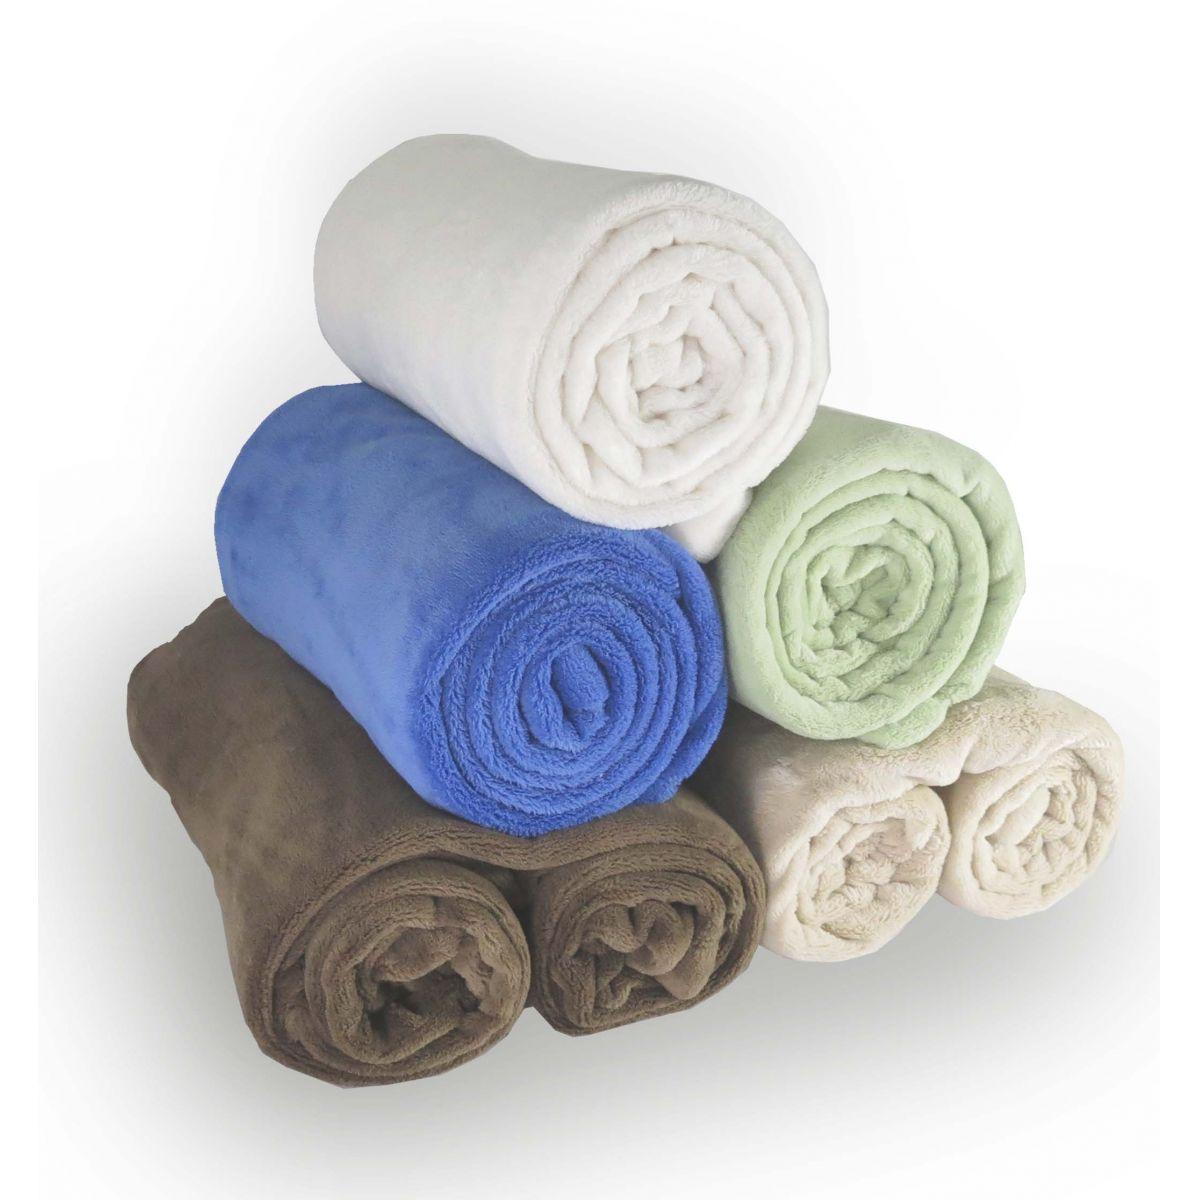 Cobertor de Microfibra Casal - Bege